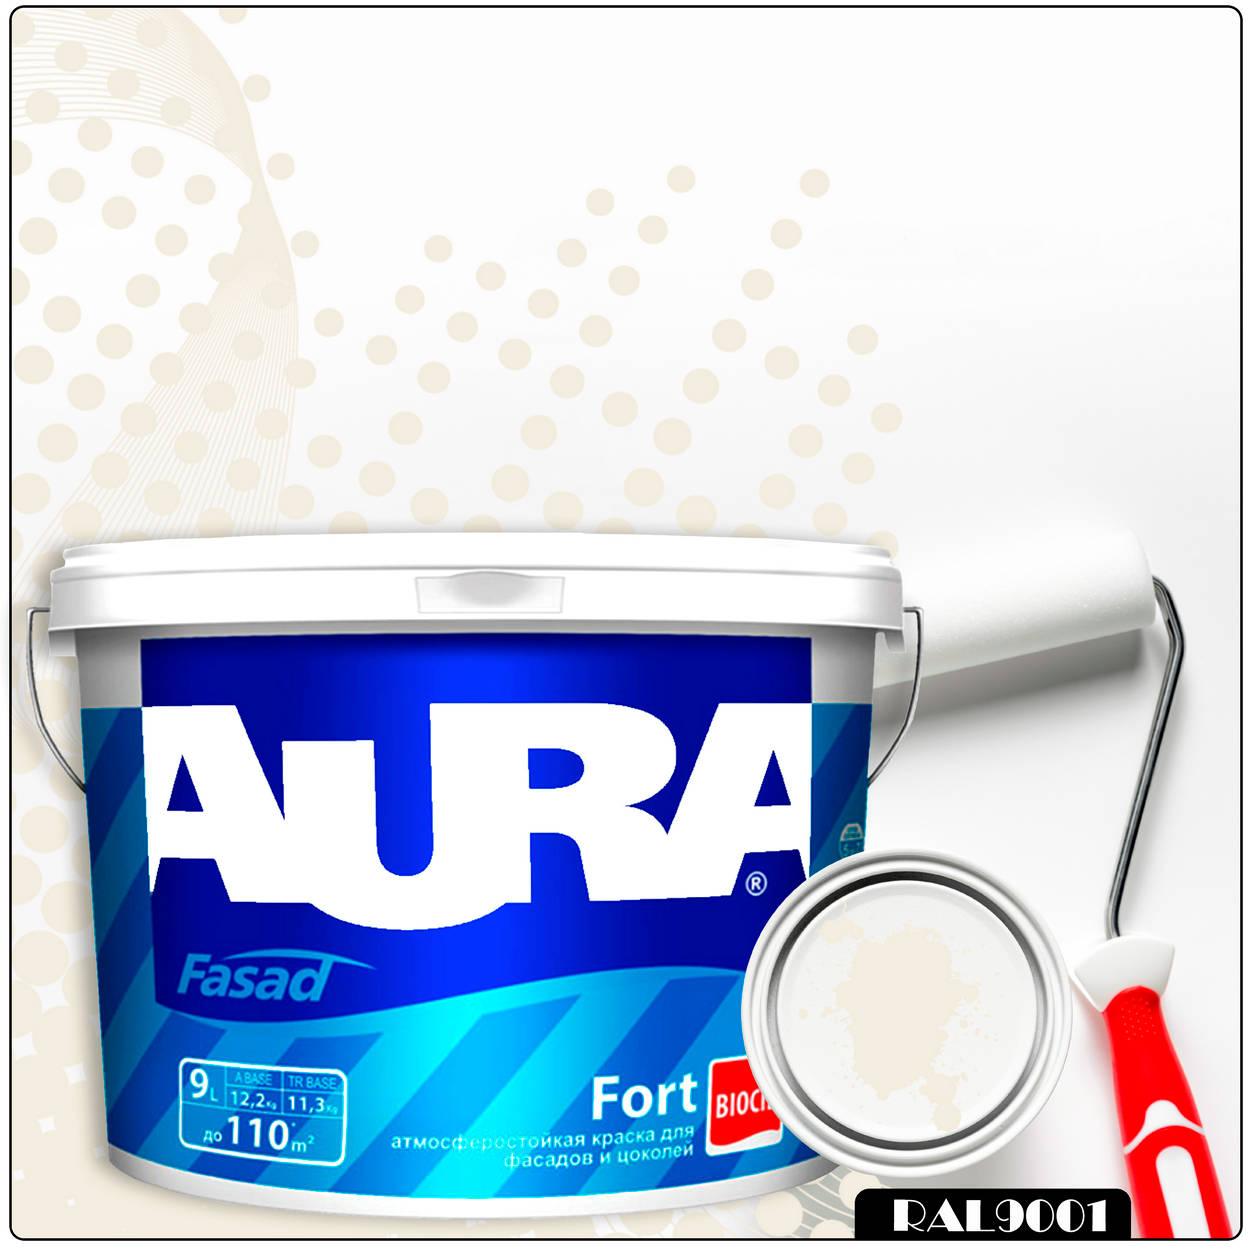 Фото 1 - Краска Aura Fasad Fort, RAL 9001 Белый крем, латексная, матовая, для фасада и цоколей, 9л, Аура.